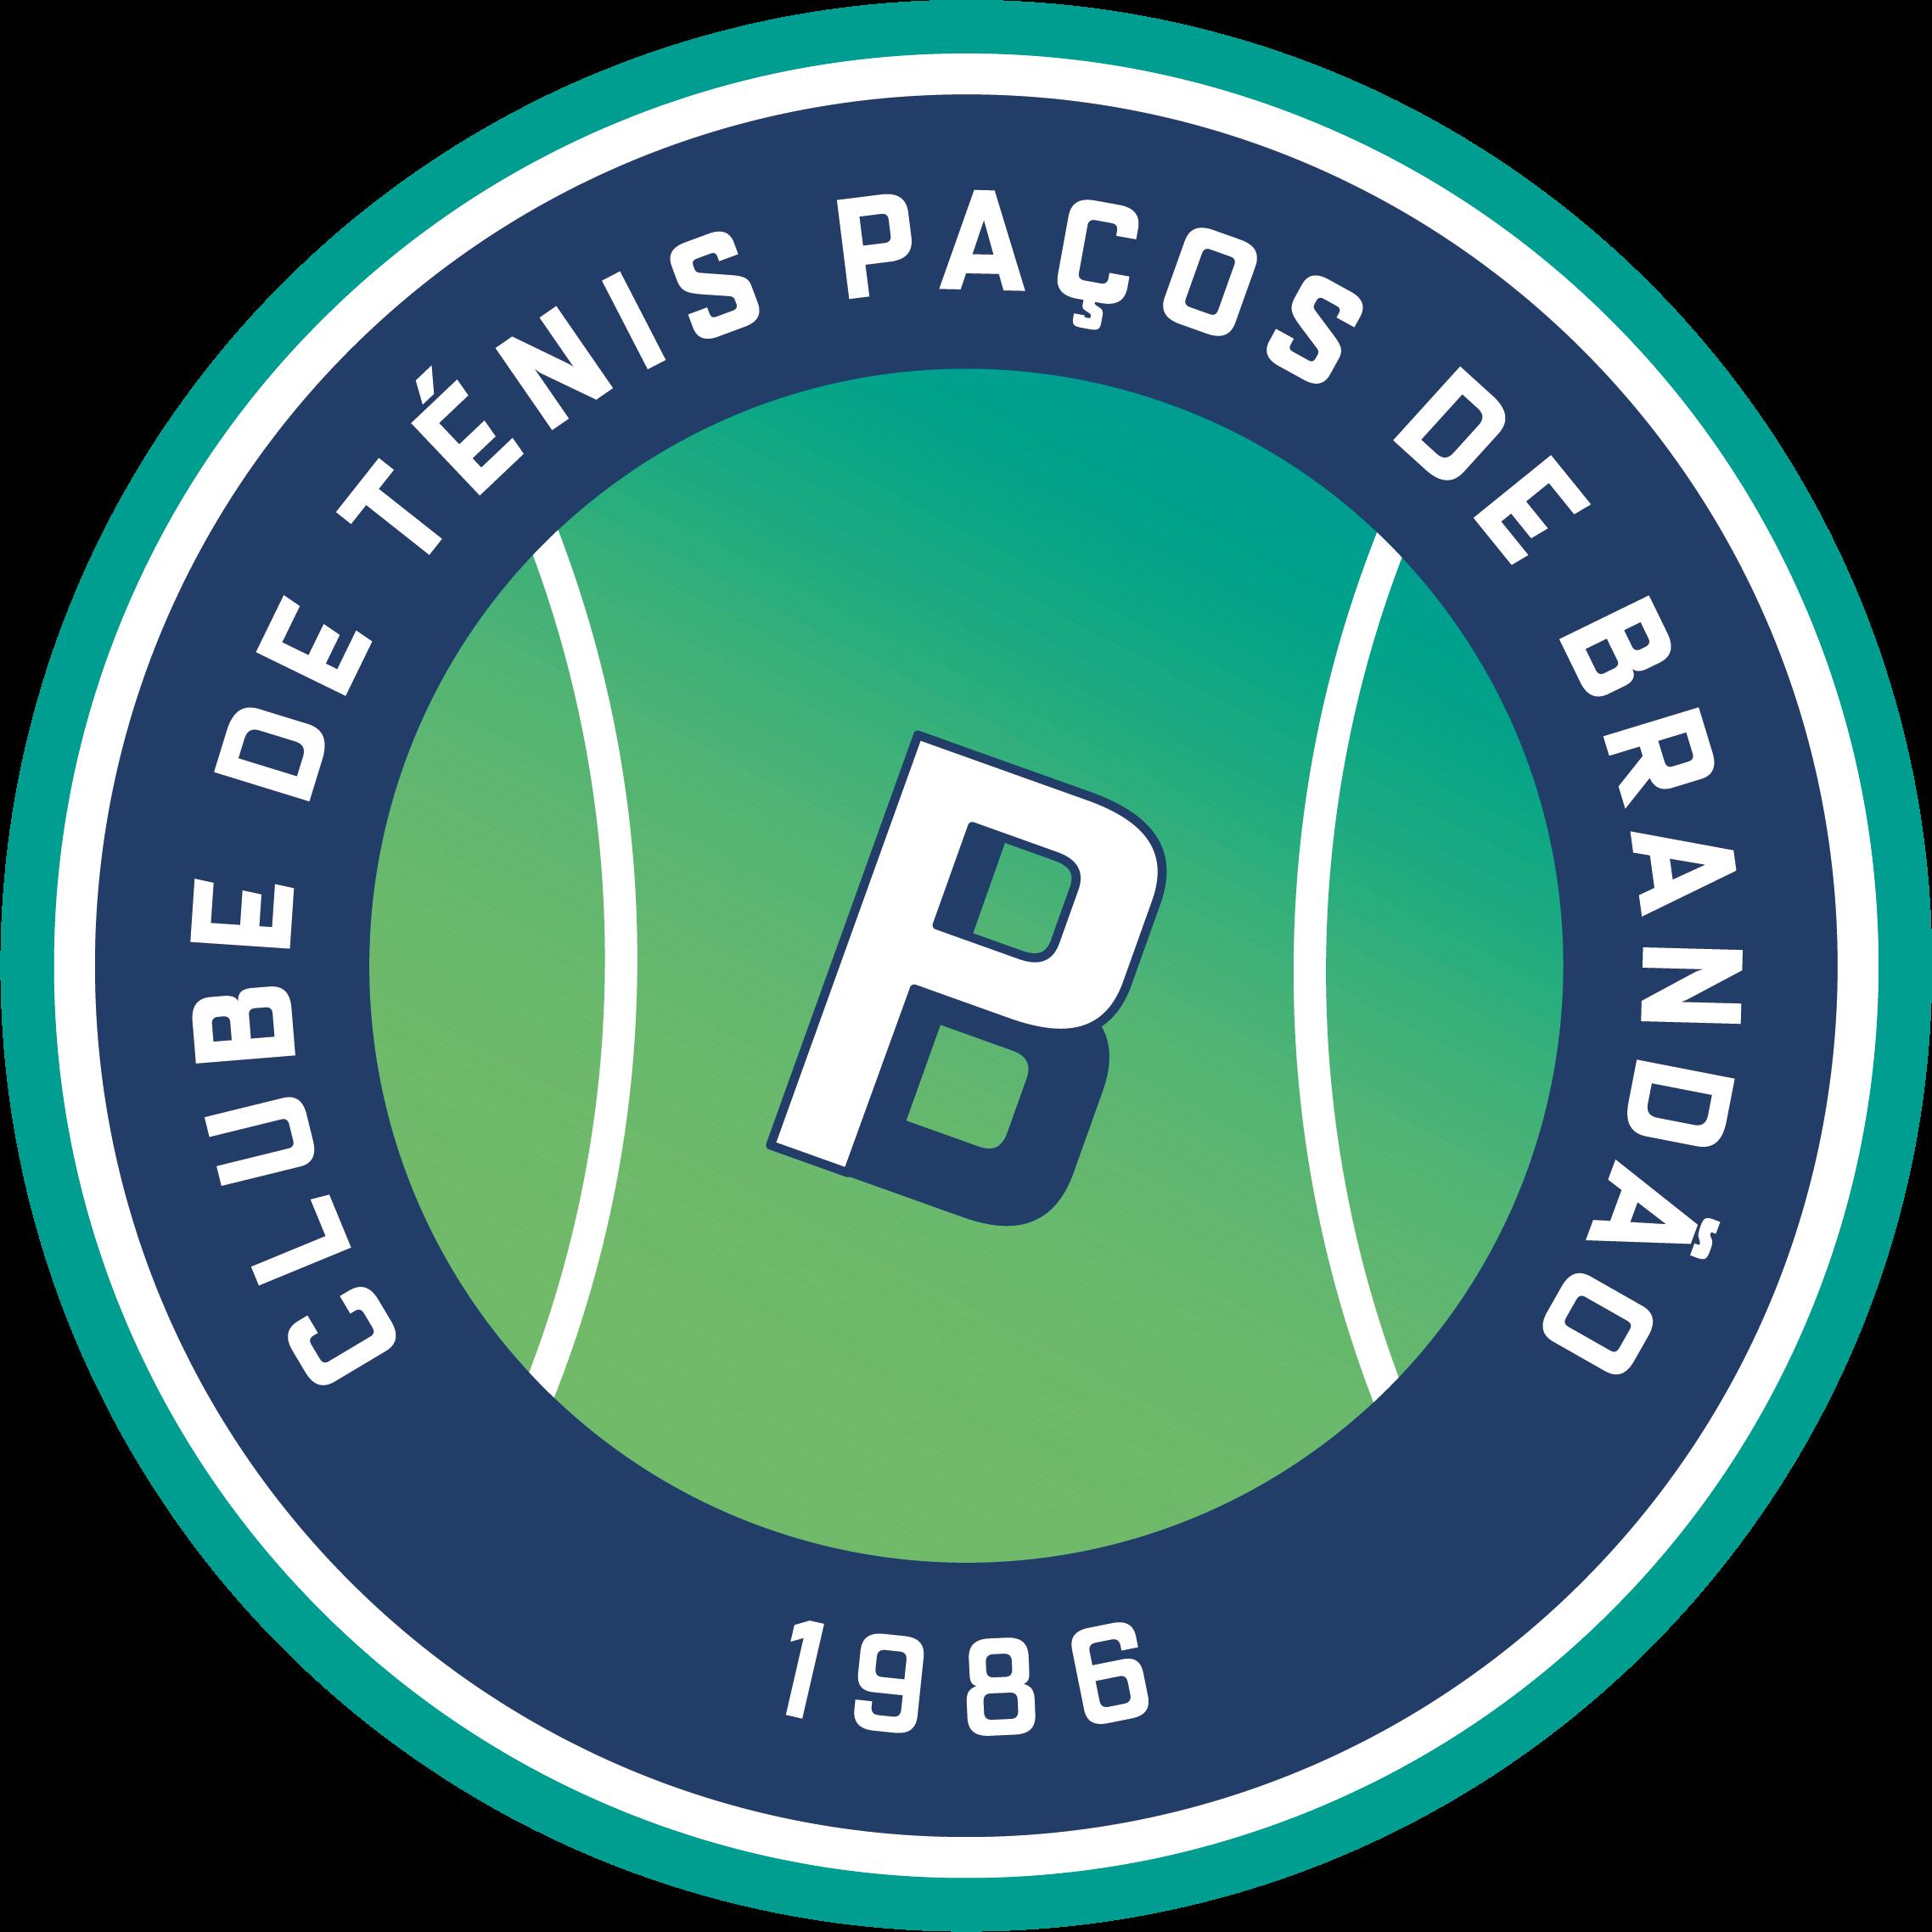 Clube Ténis Paços  Brandão